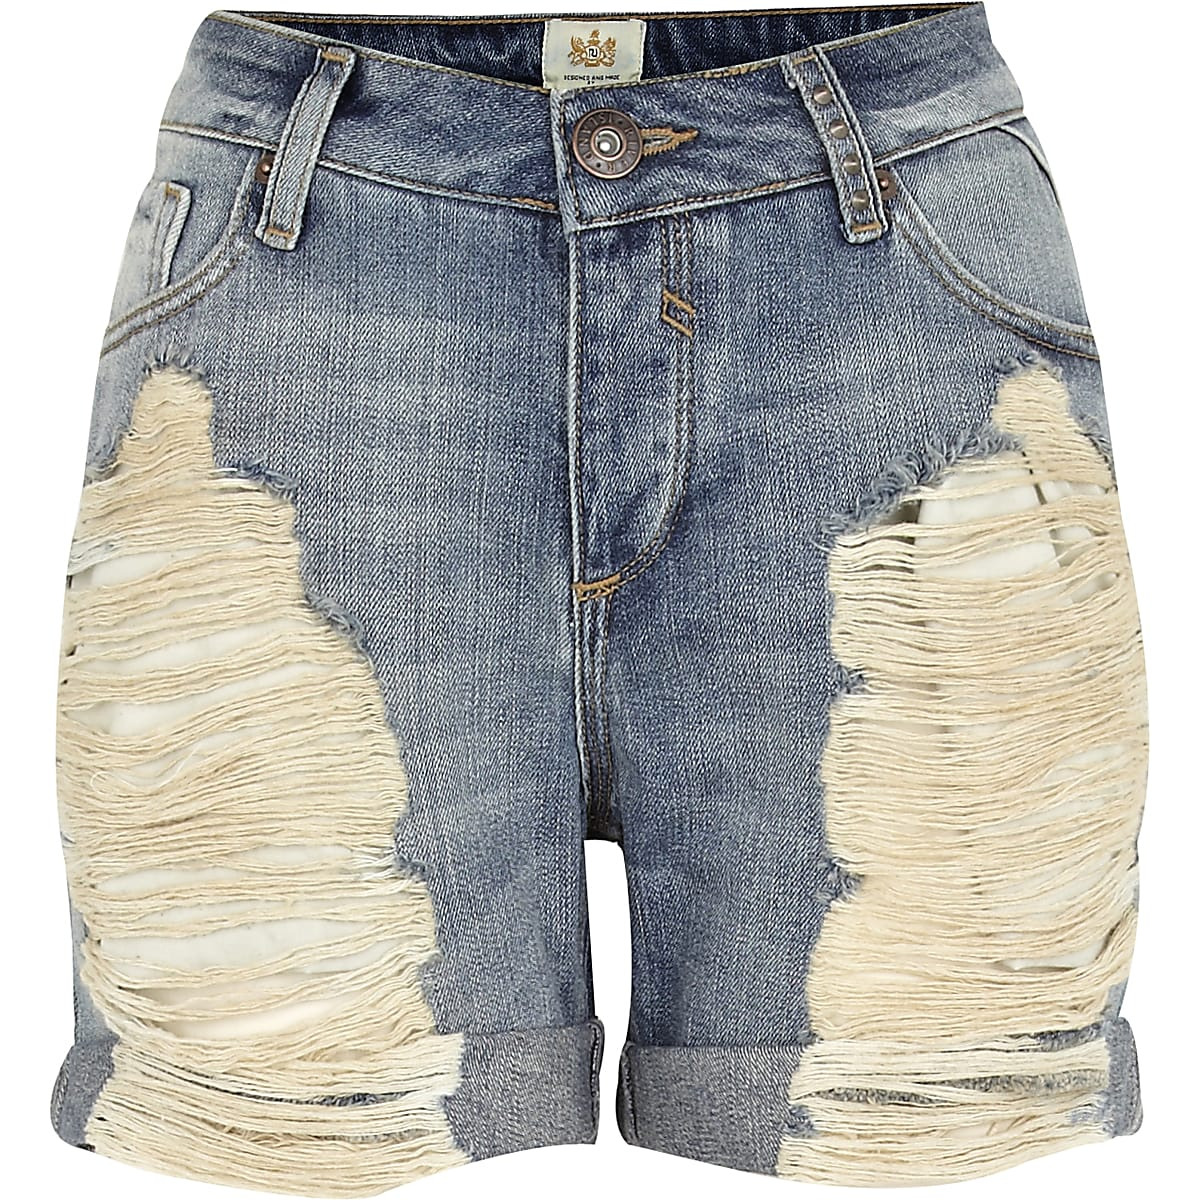 Light wash ripped denim boyfriend shorts